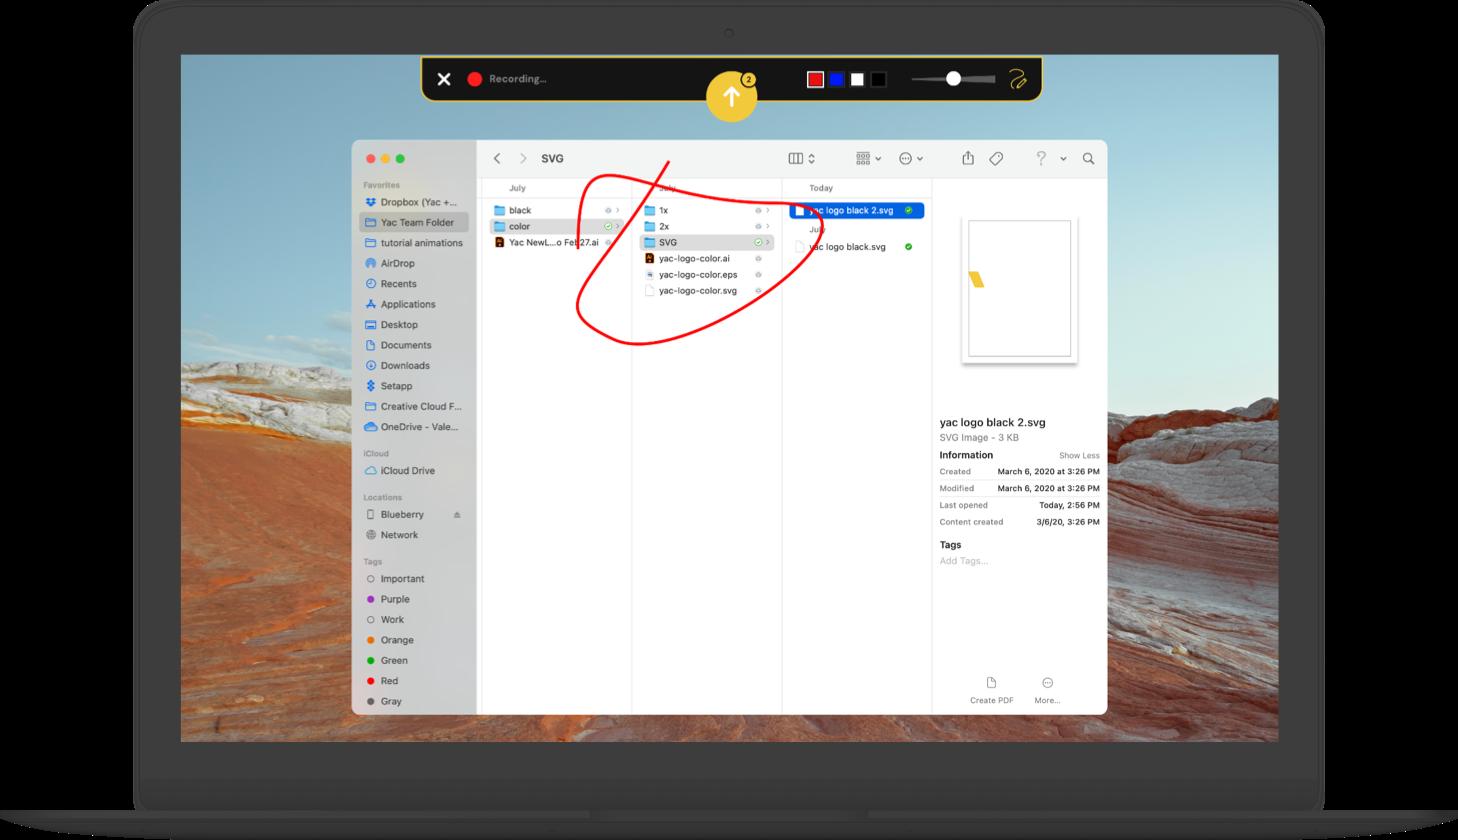 yac v3 screensharing on macbook